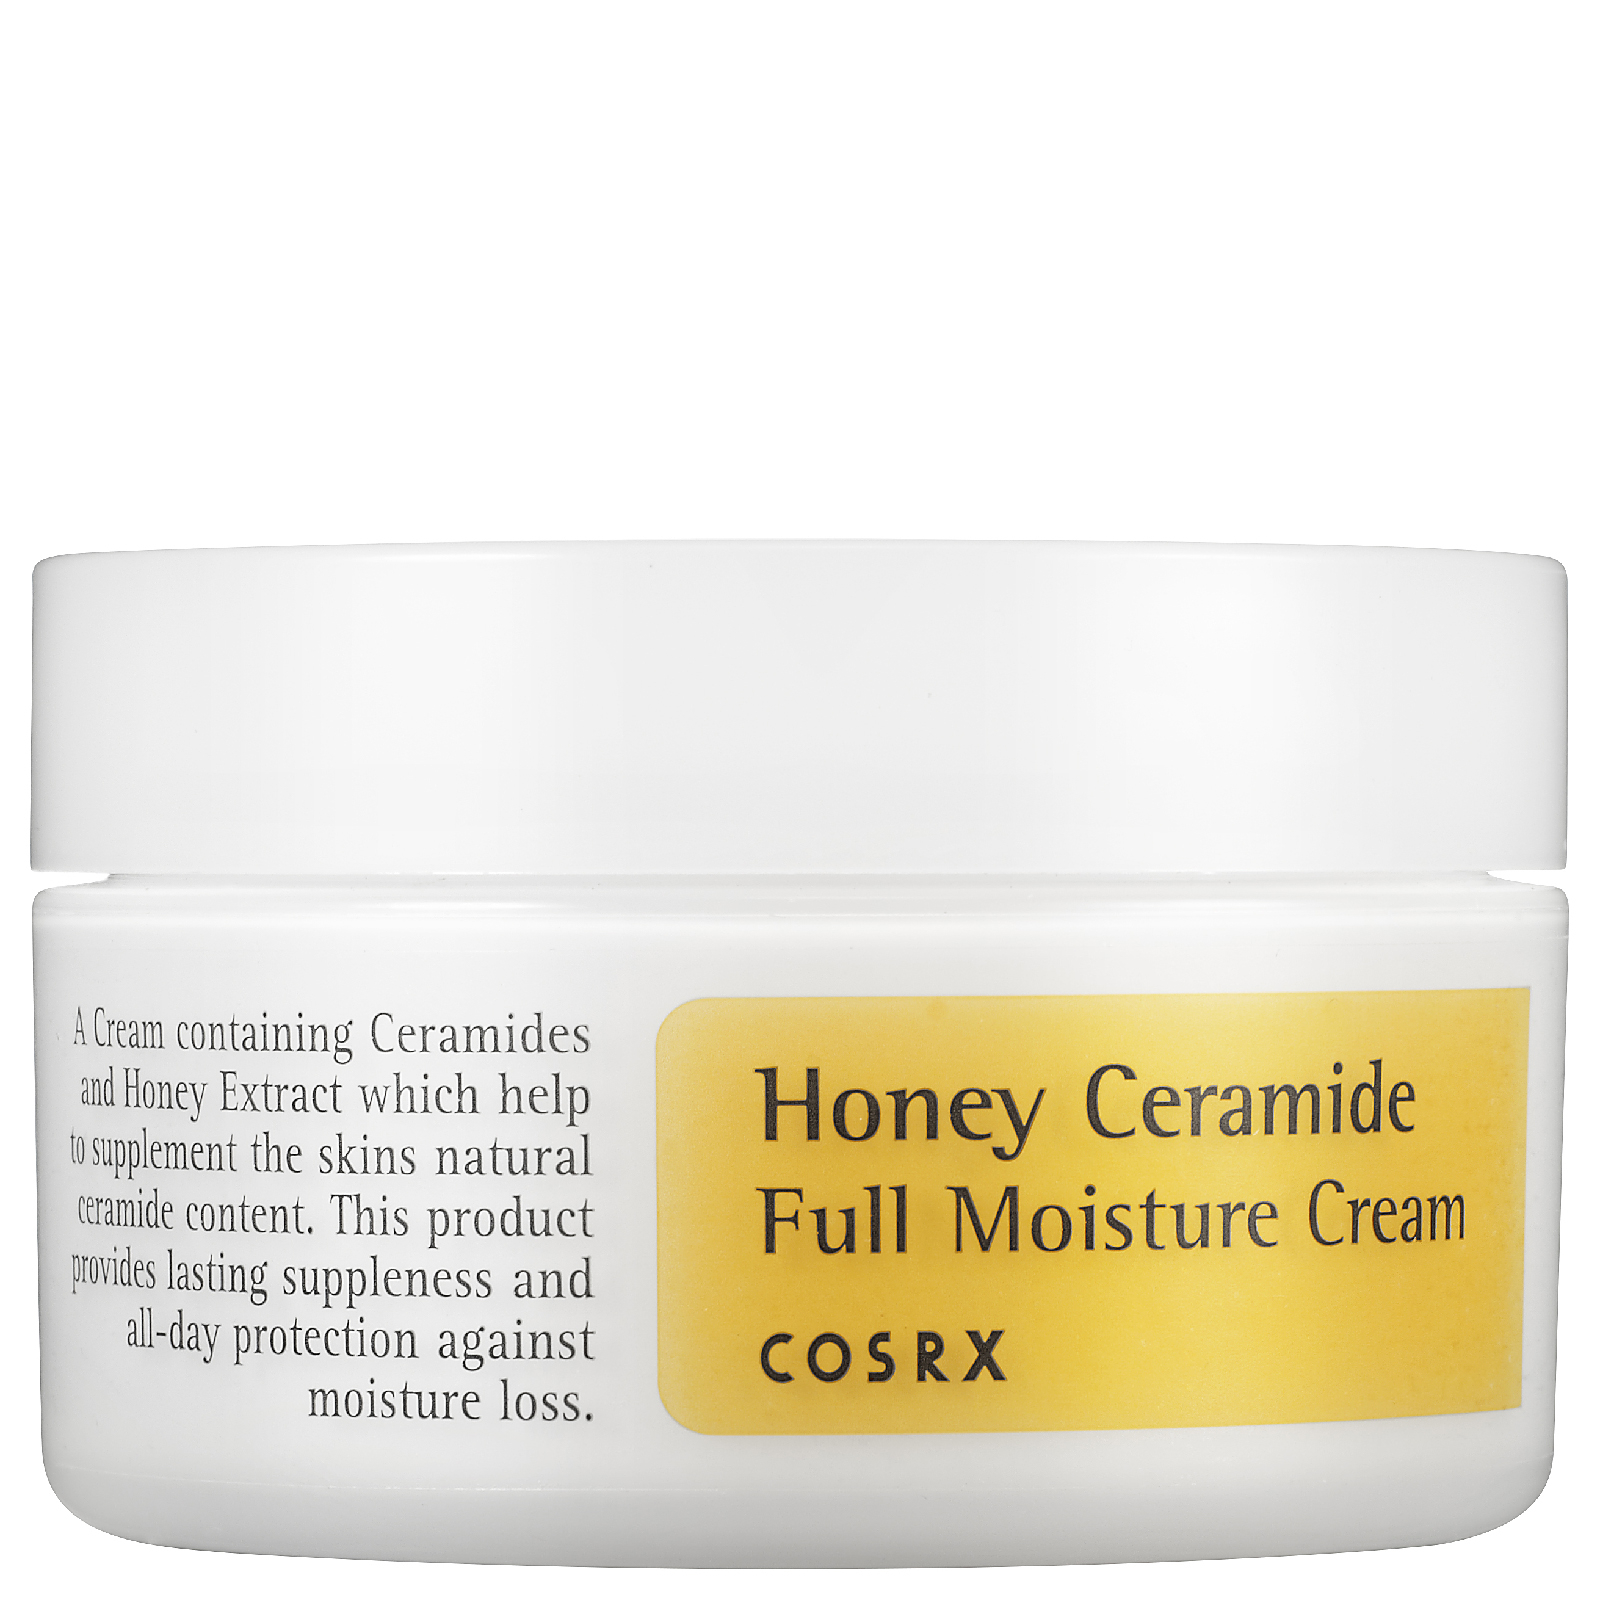 Cosrx Honey Ceramide Full Moisture Cream 50ml Beautyexpert Deryan Toddler Luxe Pueter Travel Sleeping Cot Bed Product Description